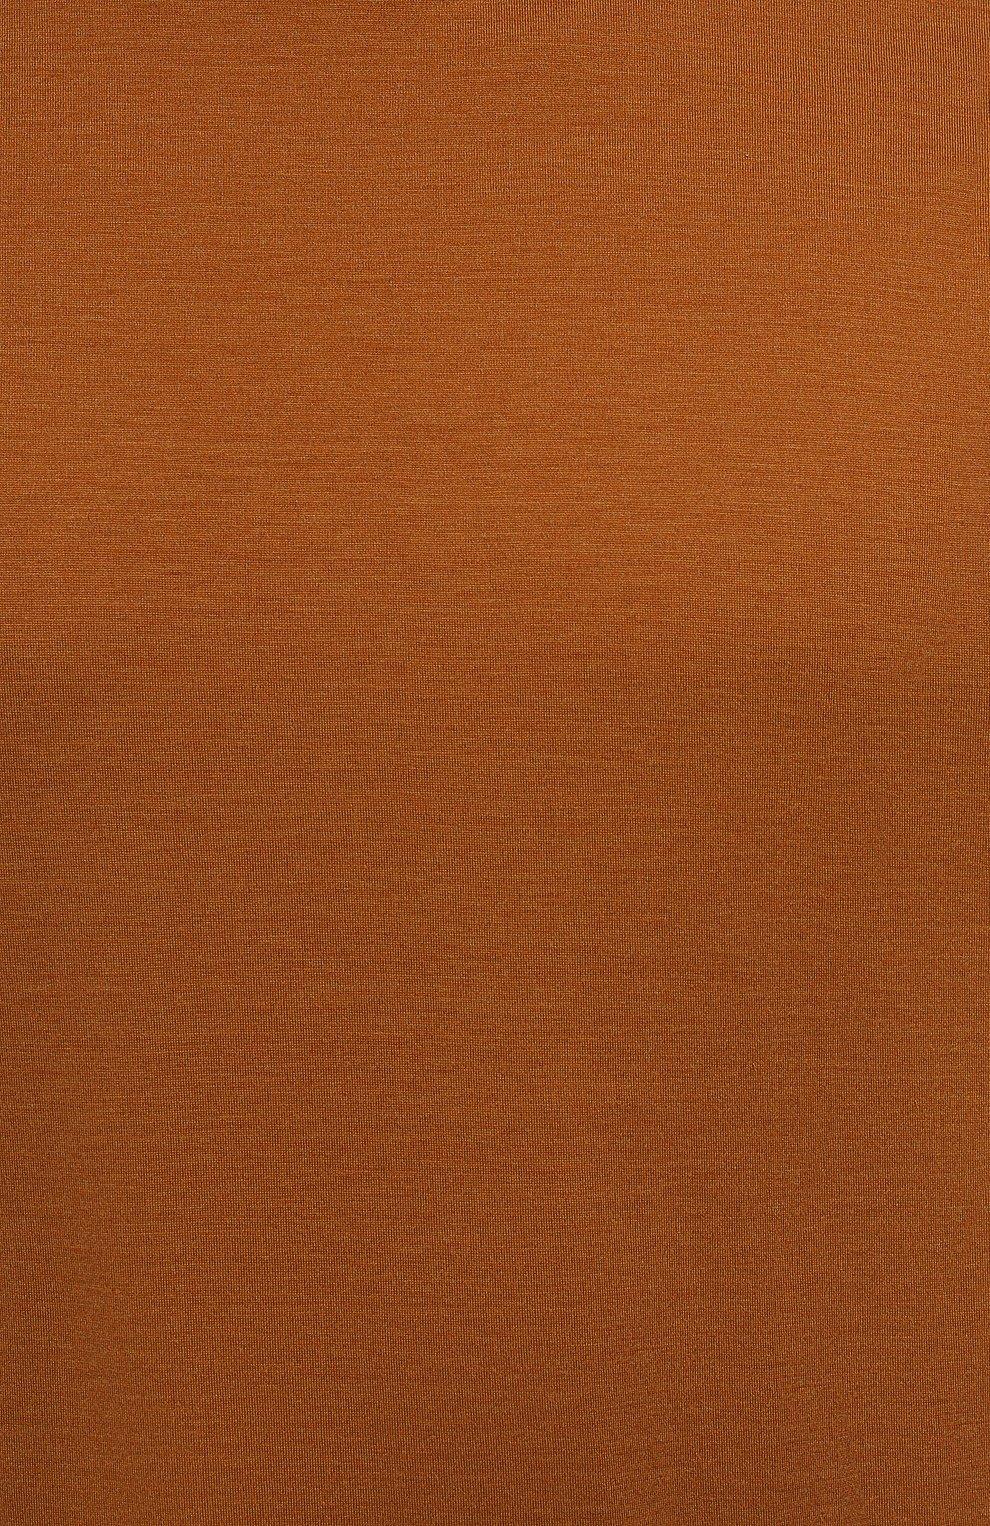 Мужская футболка из шелка и хлопка LORO PIANA светло-коричневого цвета, арт. FAF6128 | Фото 5